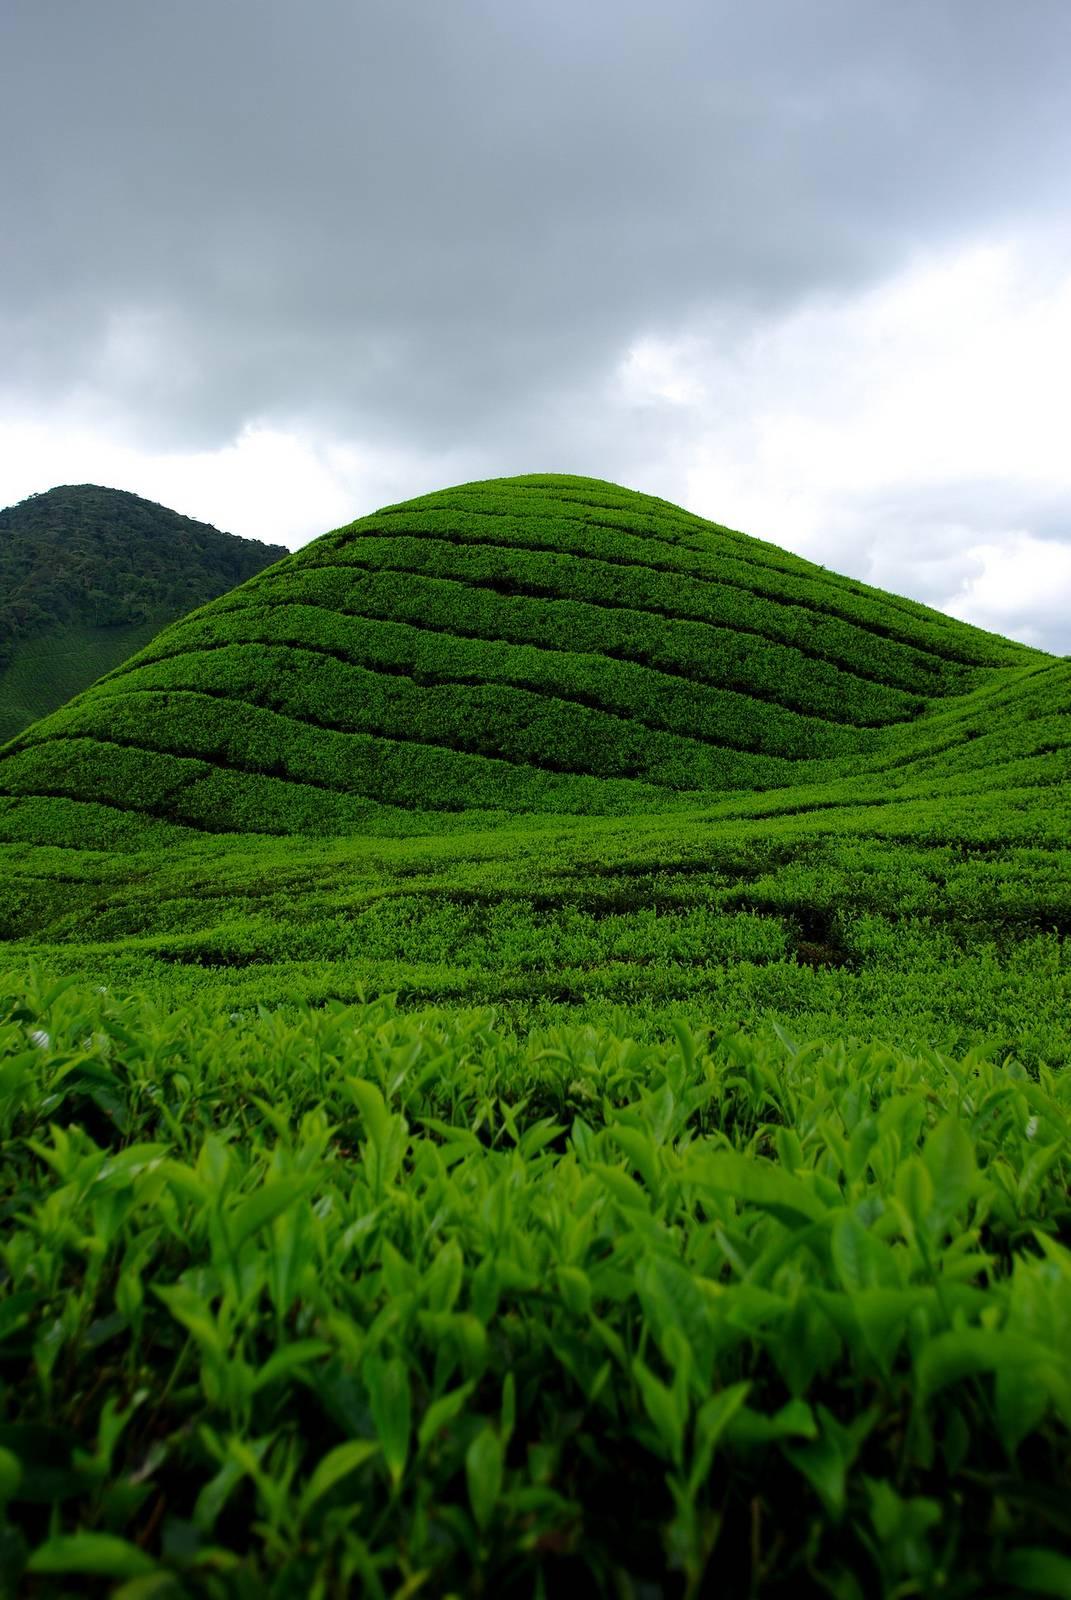 Photo 2: Cameron Highlands, balade dans les plantations de thé